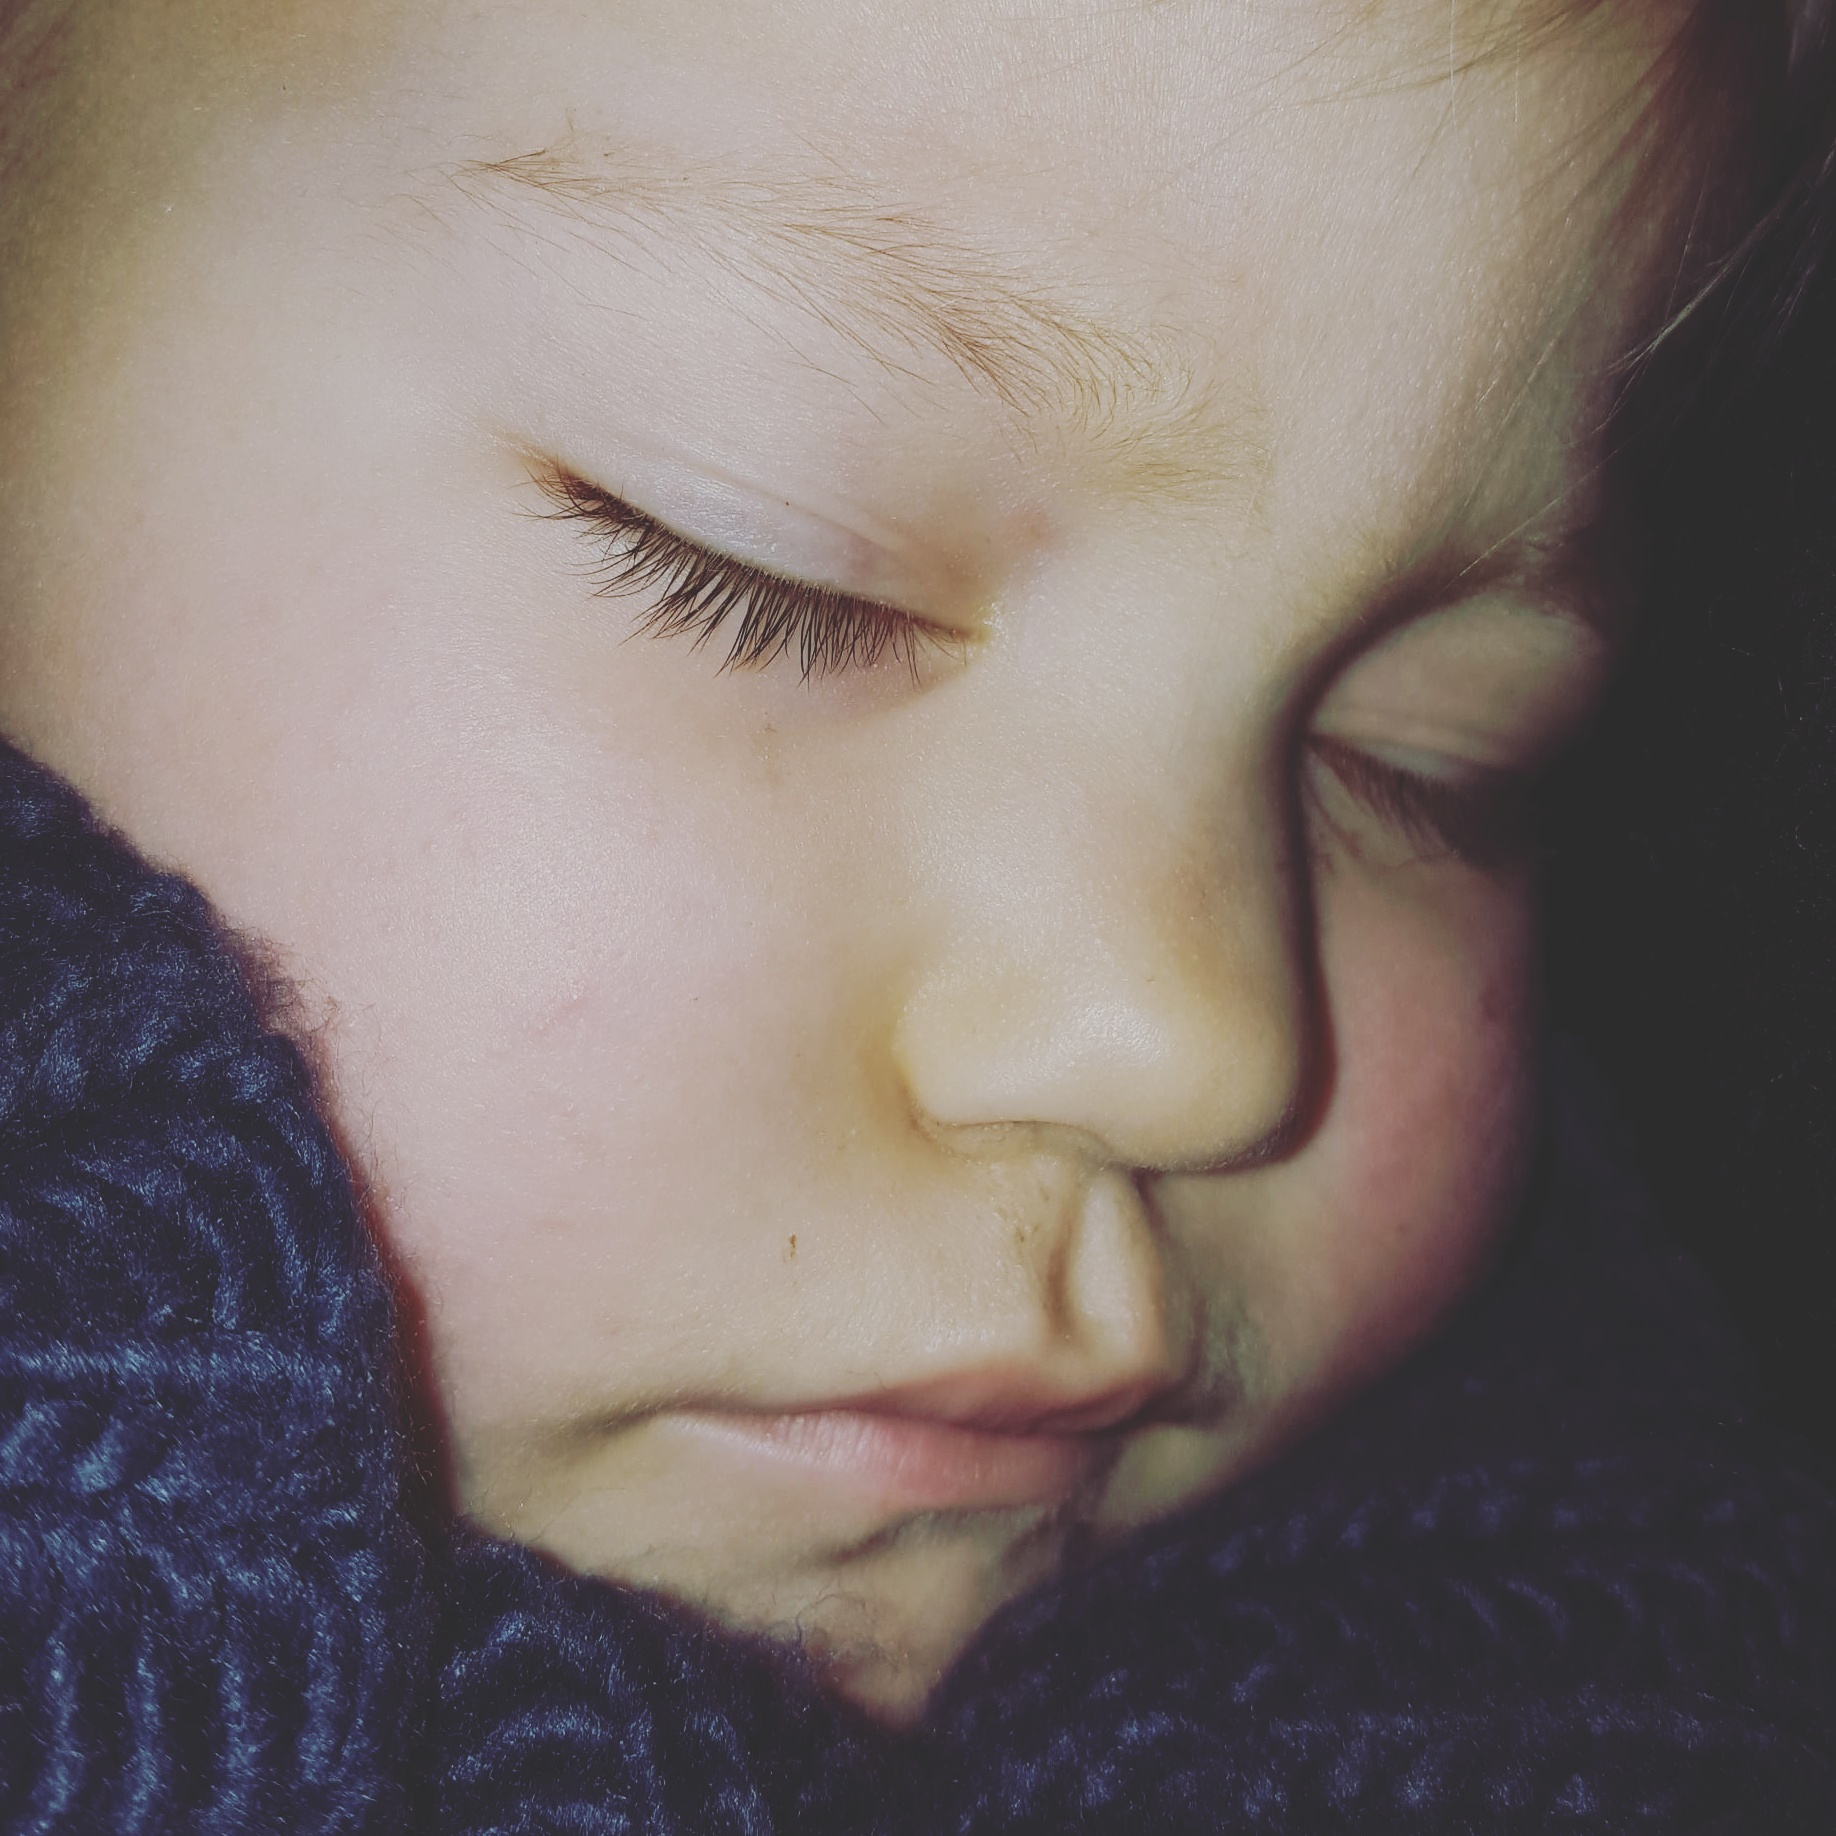 Mommy monday: Samen slapen